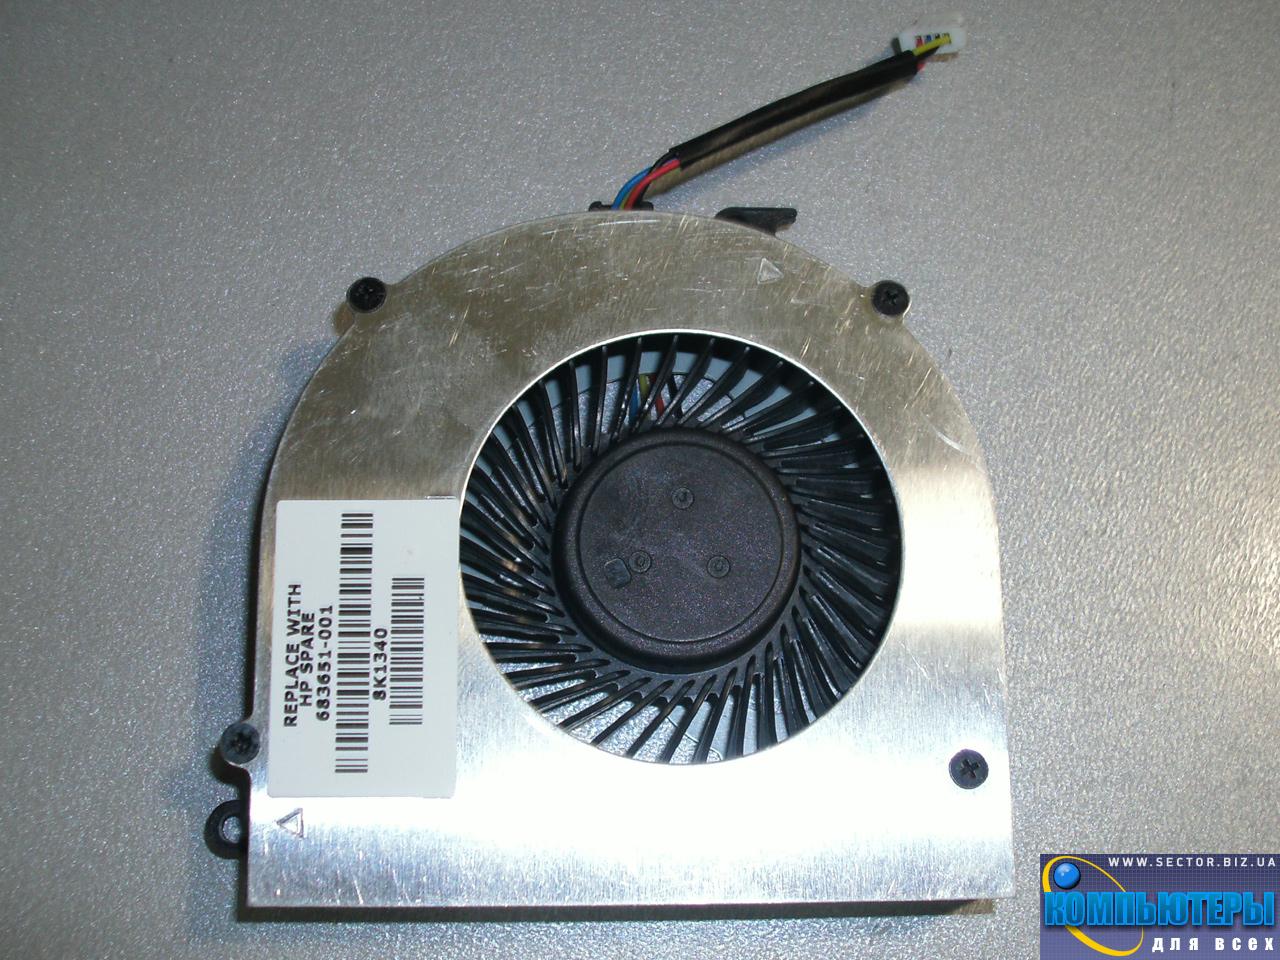 Кулер к ноутбуку HP ProBook 4440S 4441S 4445S 4446S p/n: DFS531005PL0T FB7Q 23.10605.001. Фото № 4.